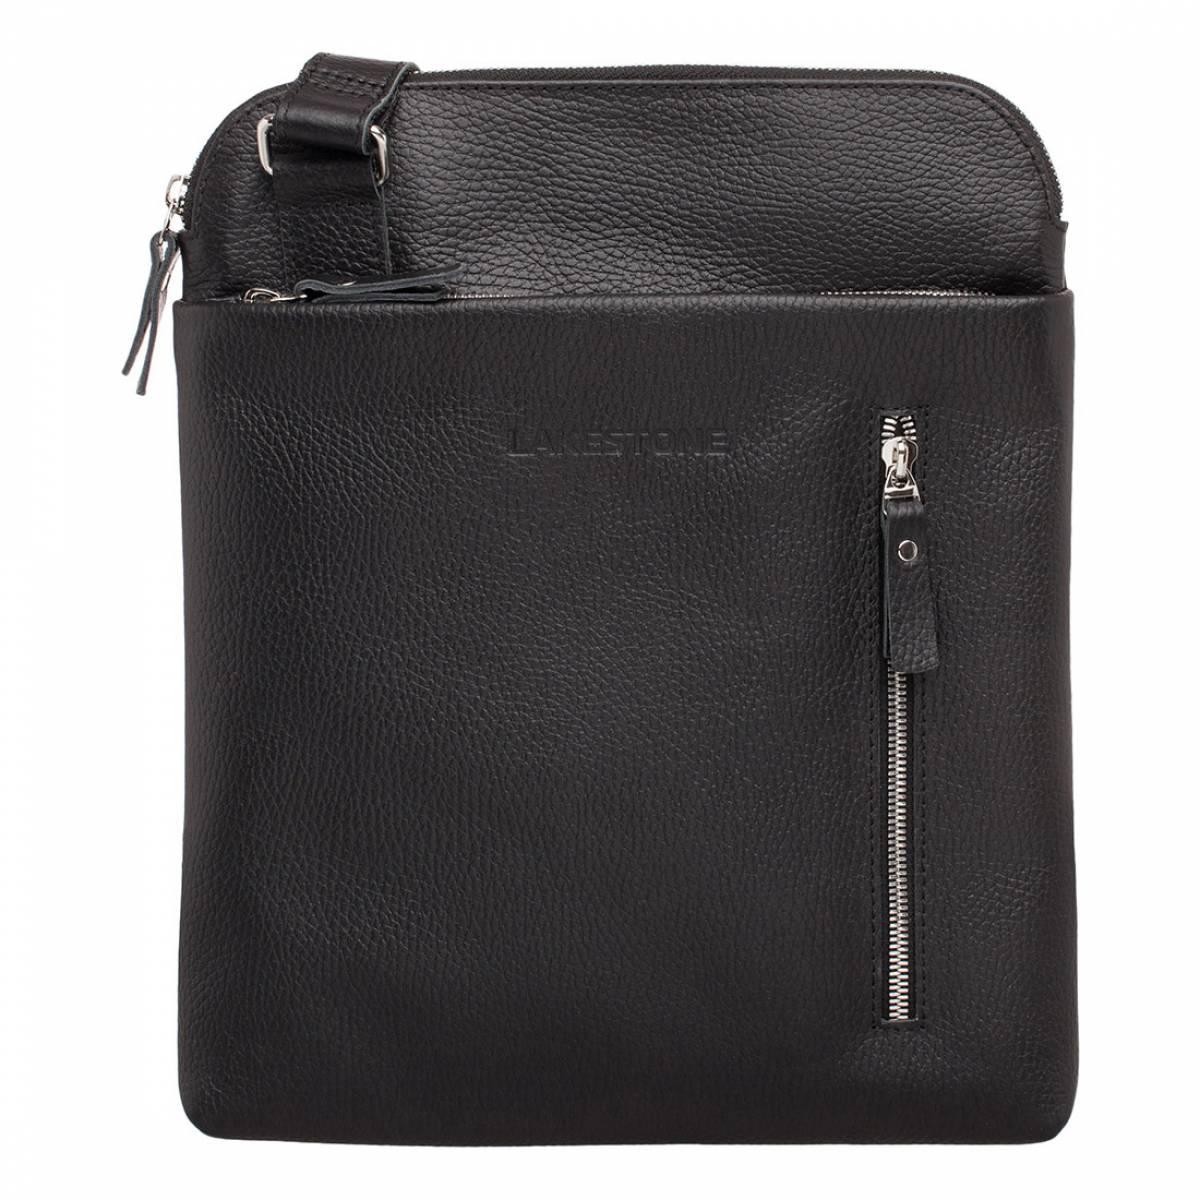 Кожаная сумка через плечо Fabian Black фото